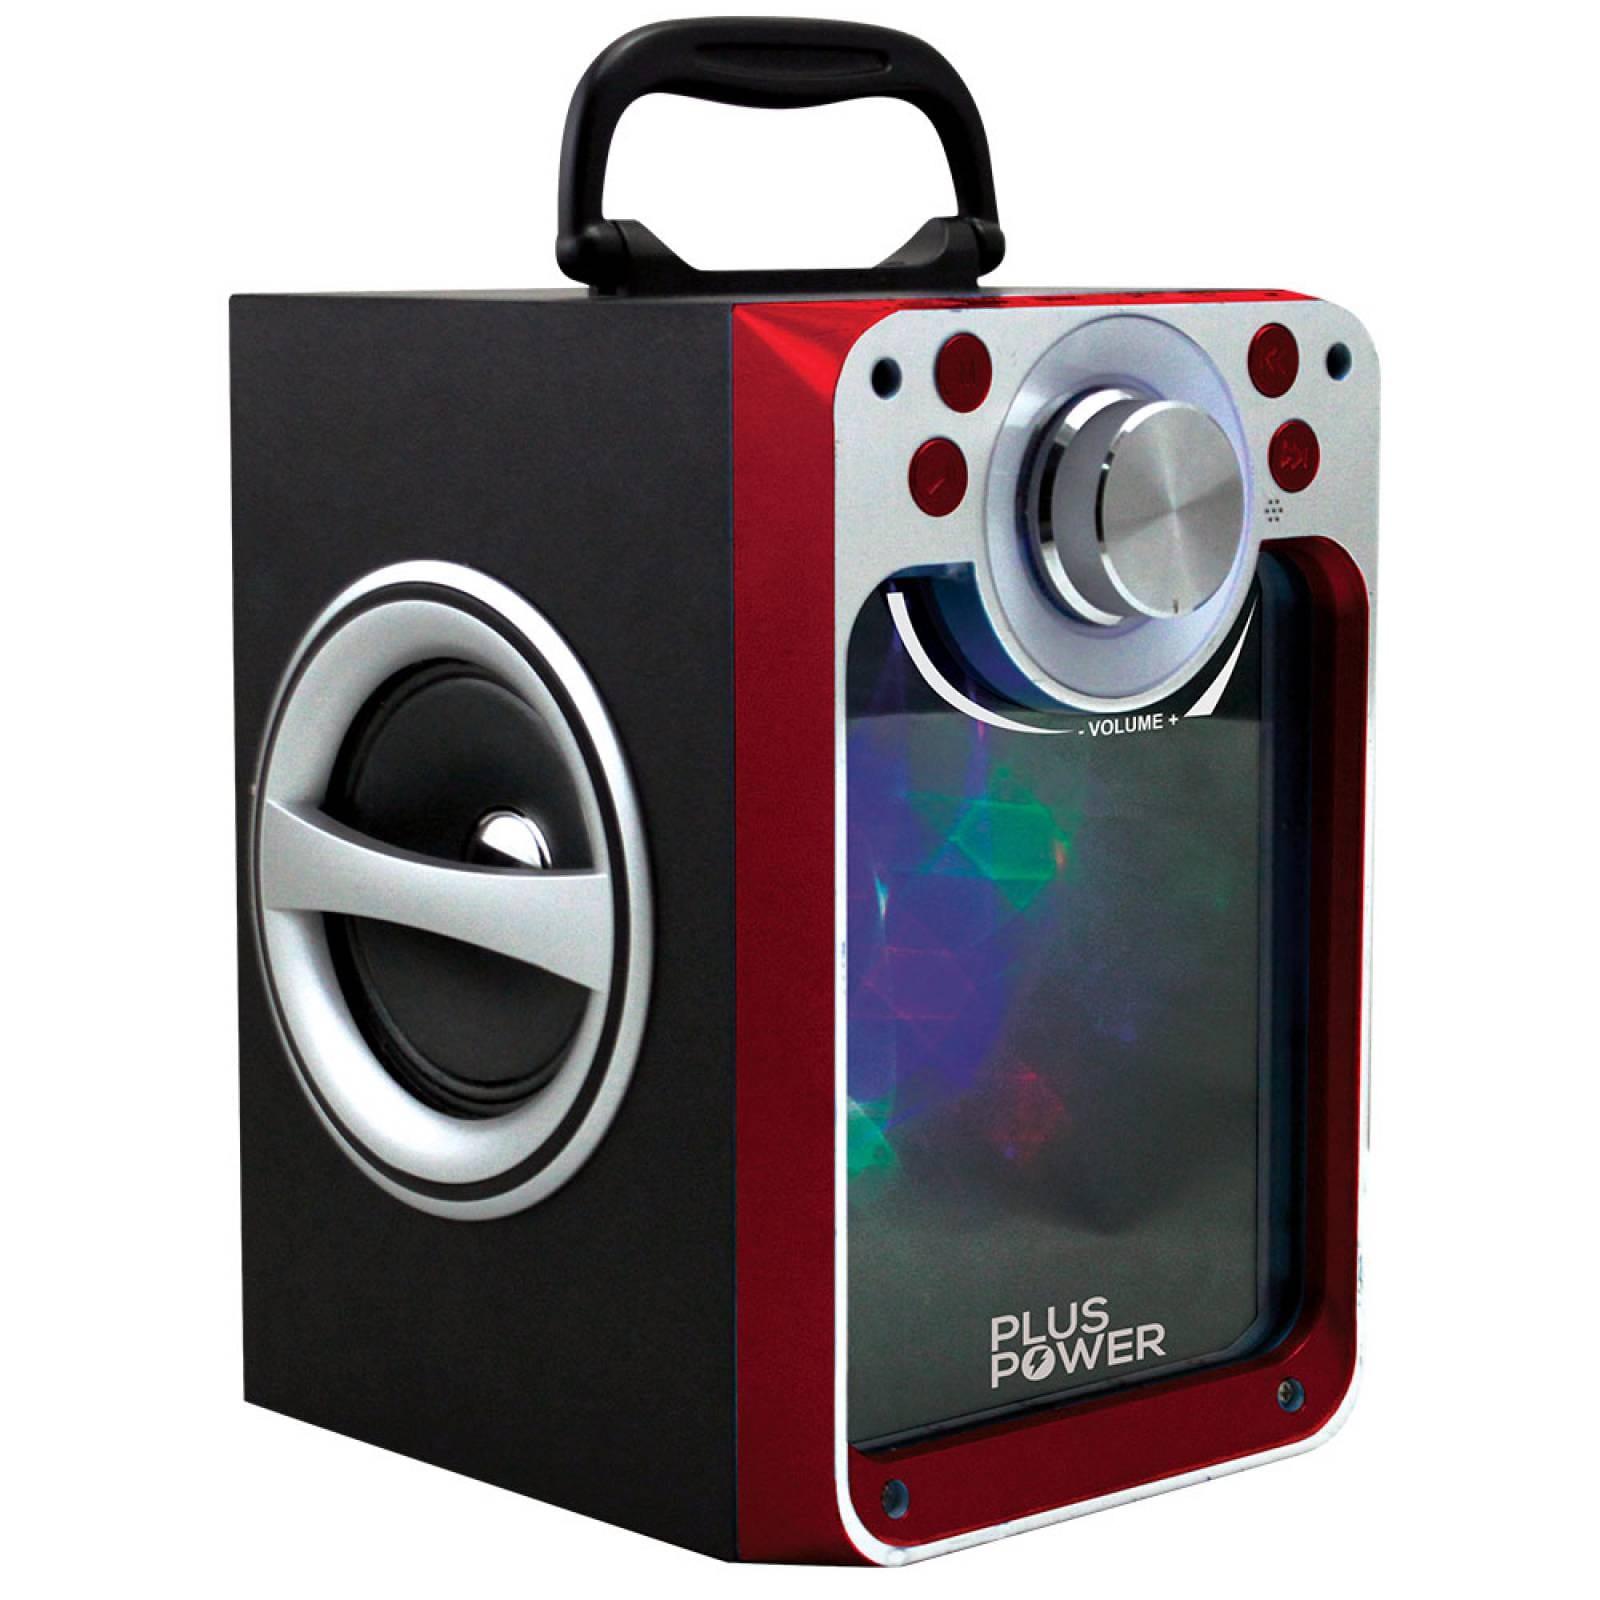 Bocina Portatil Bluetooth Plus Power Usb C/ Luz Led Pp-wbt14